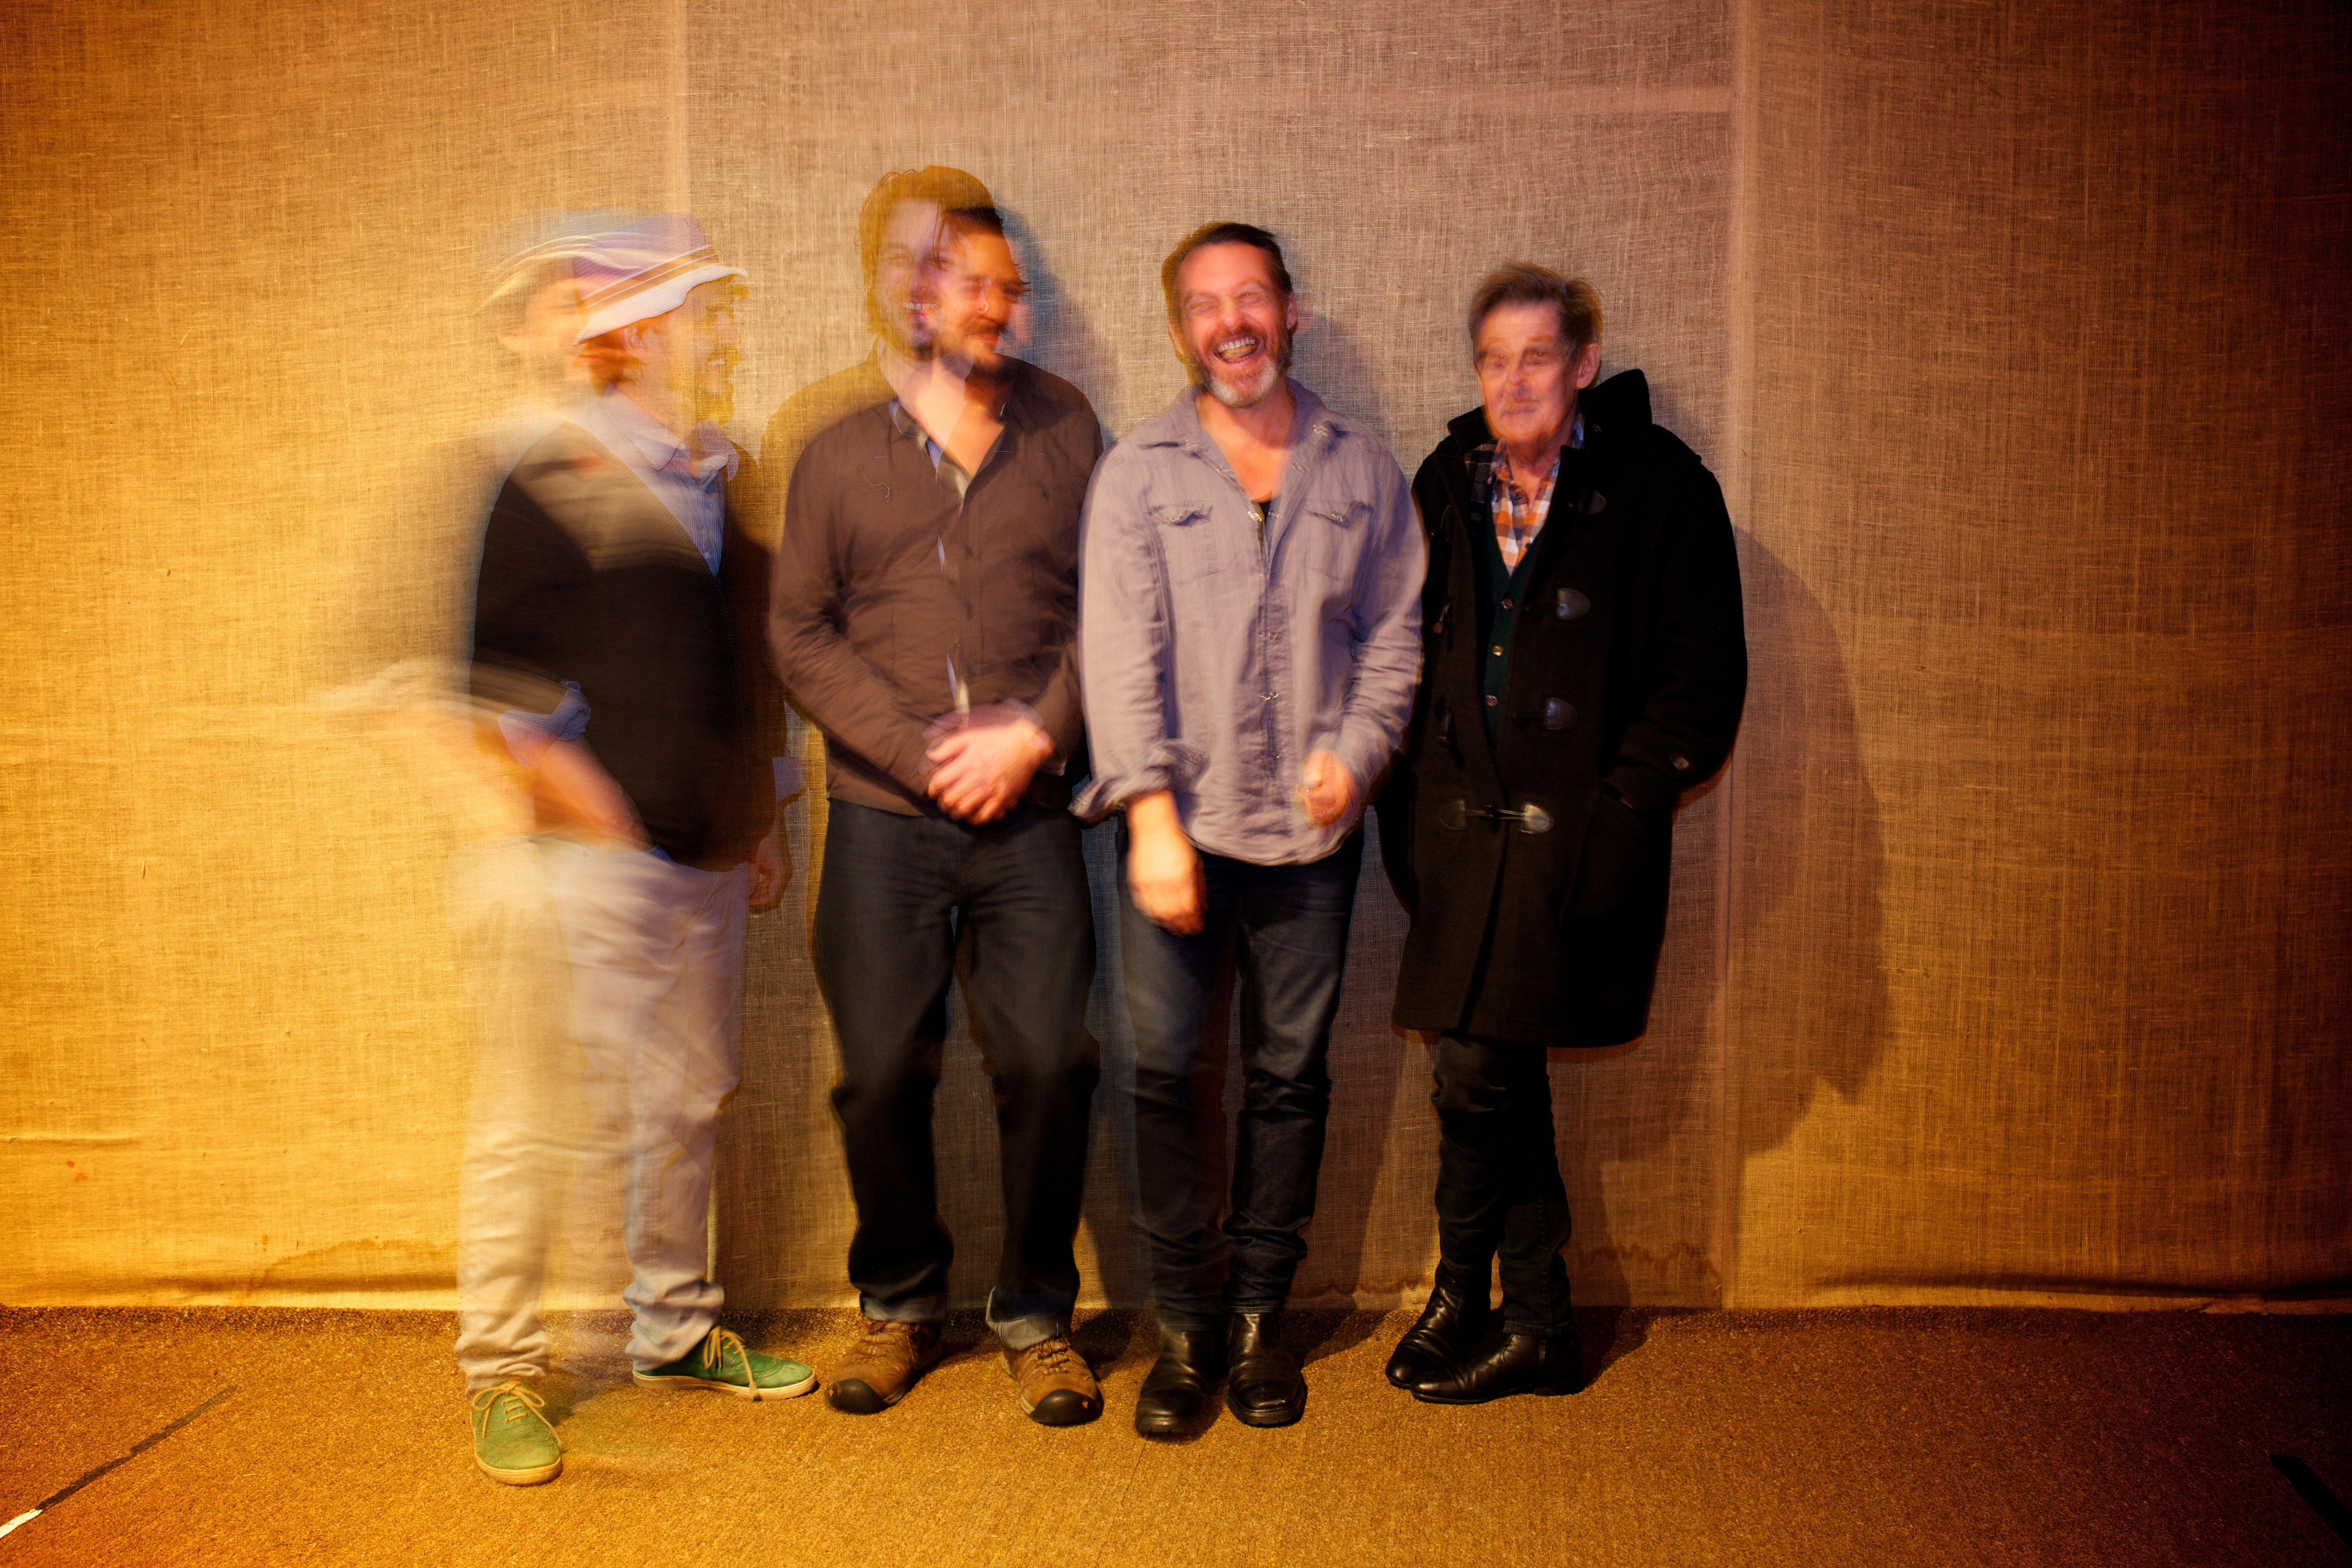 Photo by J.Zwartz - L-R: Barney McAll, Julien Wilson, Jonathan Zwartz, Allan Browne - Click on photo to download 300DPI copy